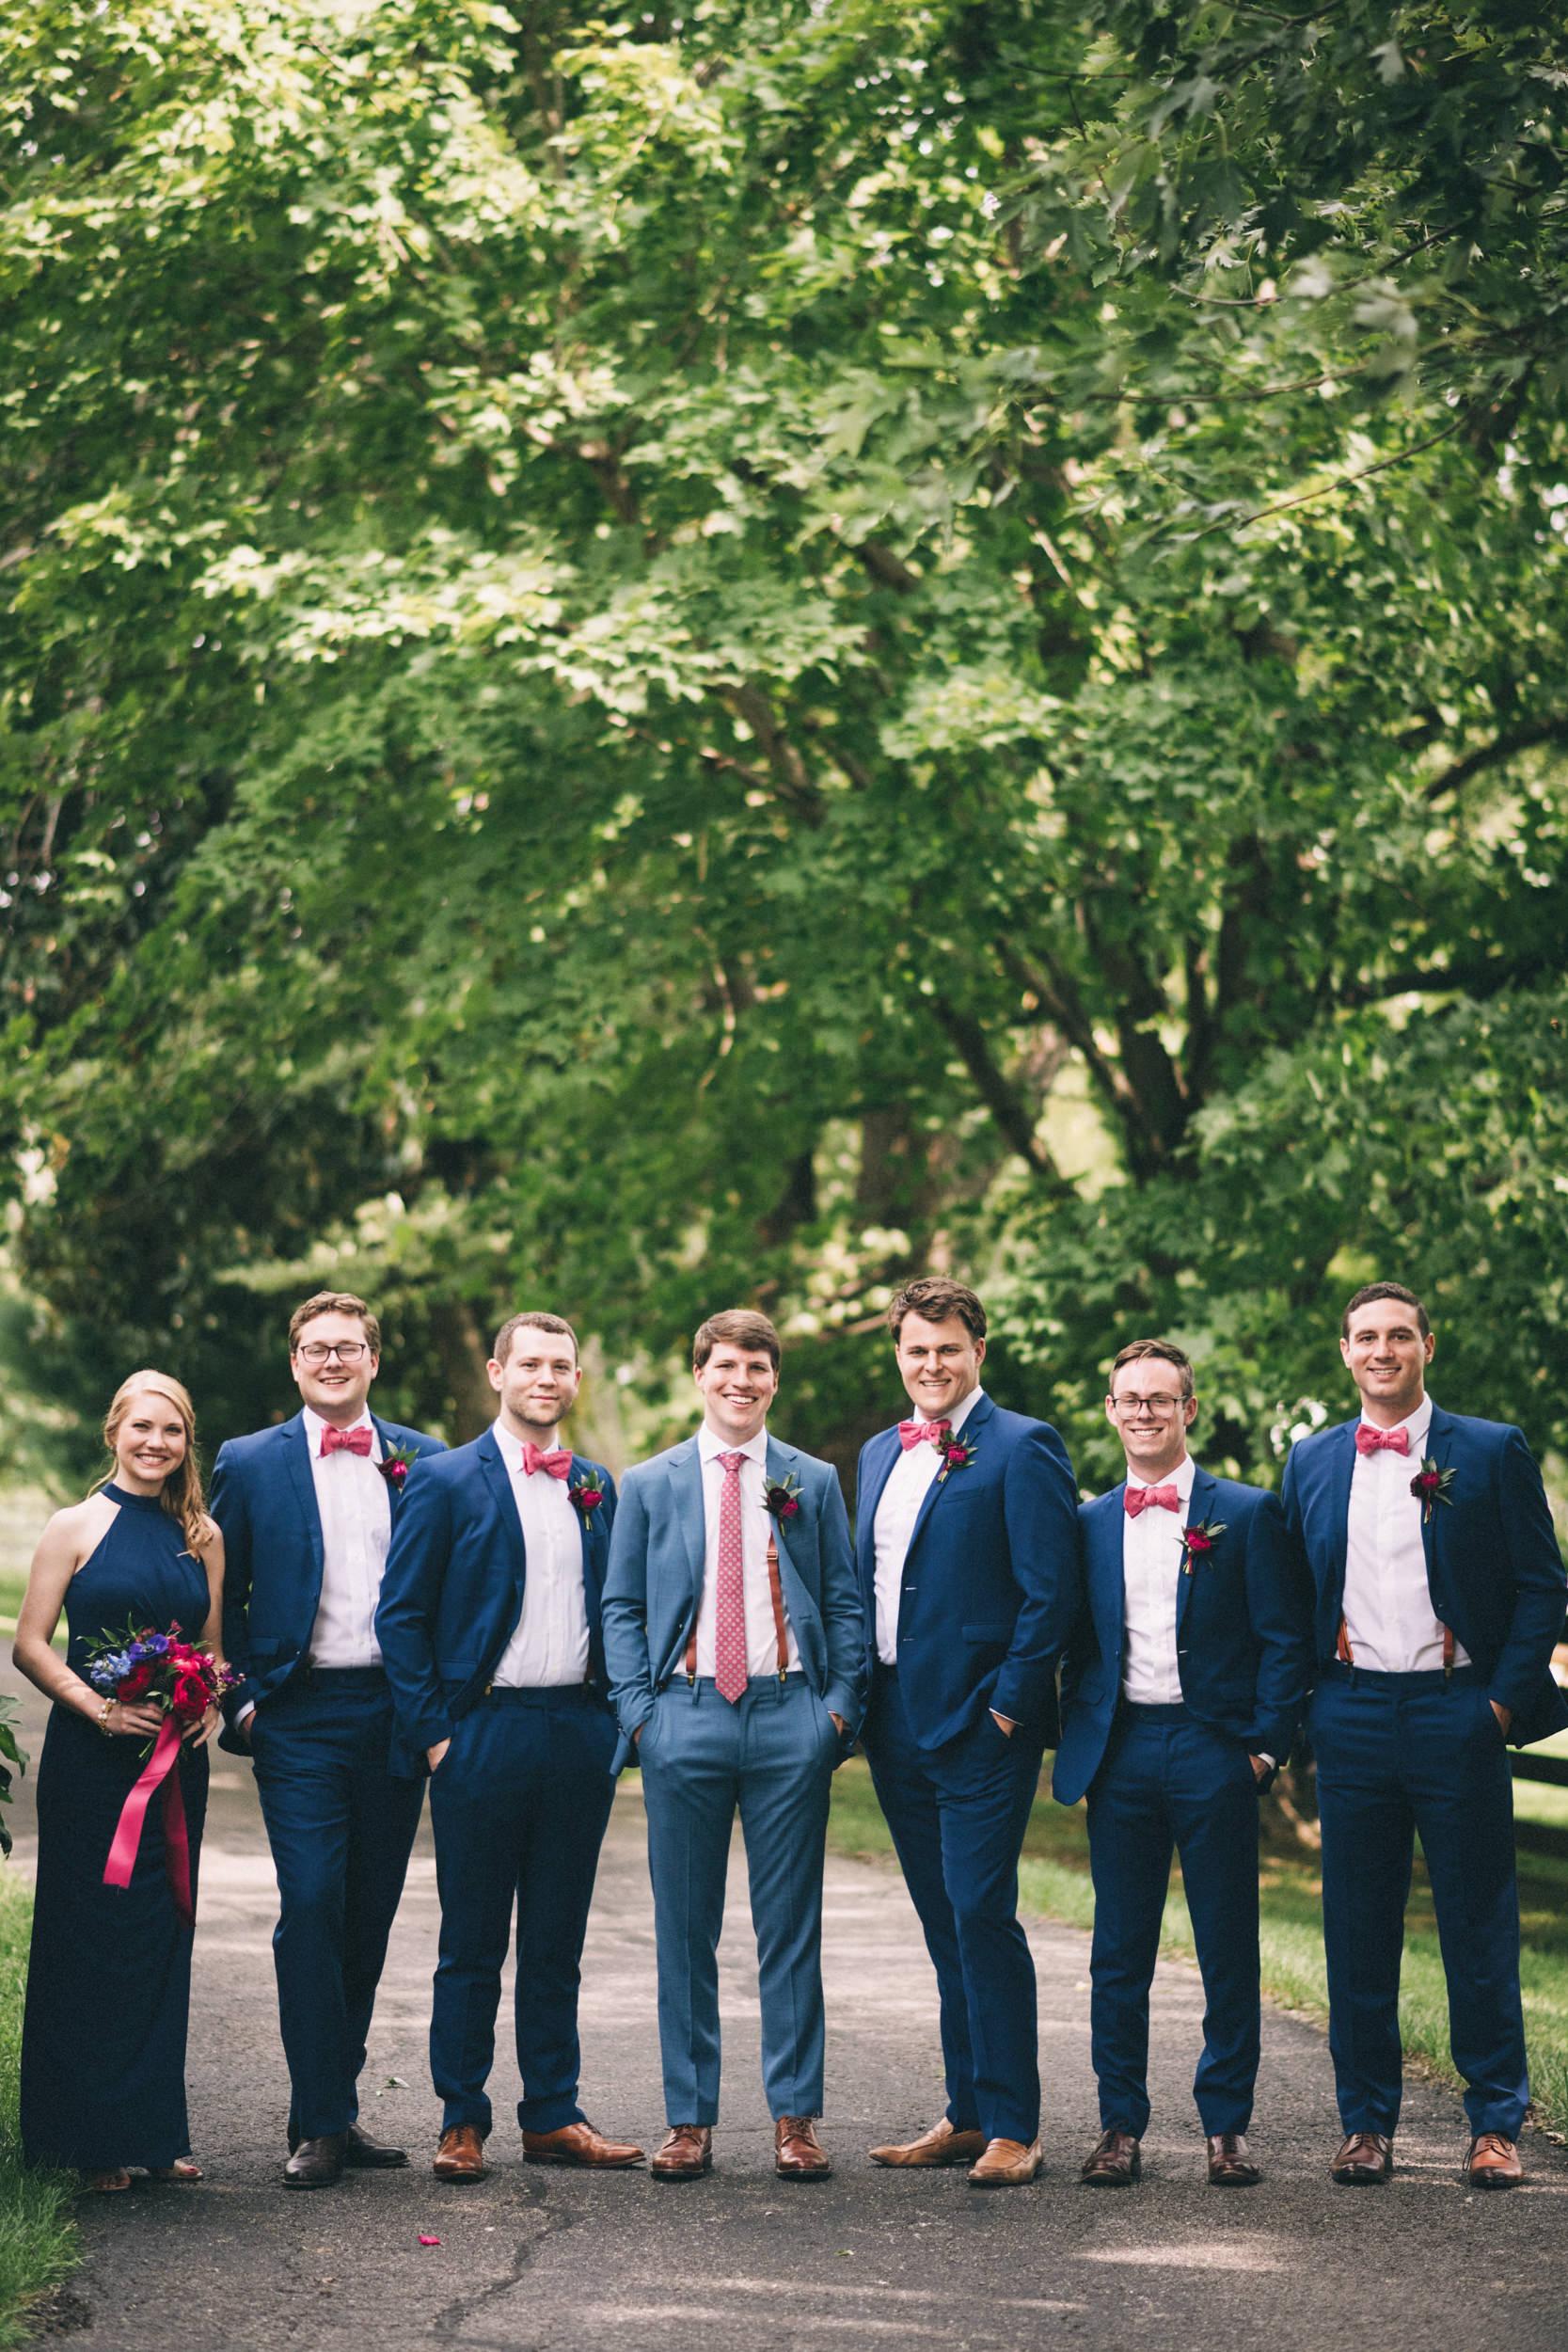 Louisville-Kentucky-Wedding-and-Elopement-Photographer-Sarah-Katherine-Davis-Photography-Summer-Jewel-Toned-Wedding-Chineese-Tea-Ceremony-Warrenwood-Manor-Danville-275.jpg